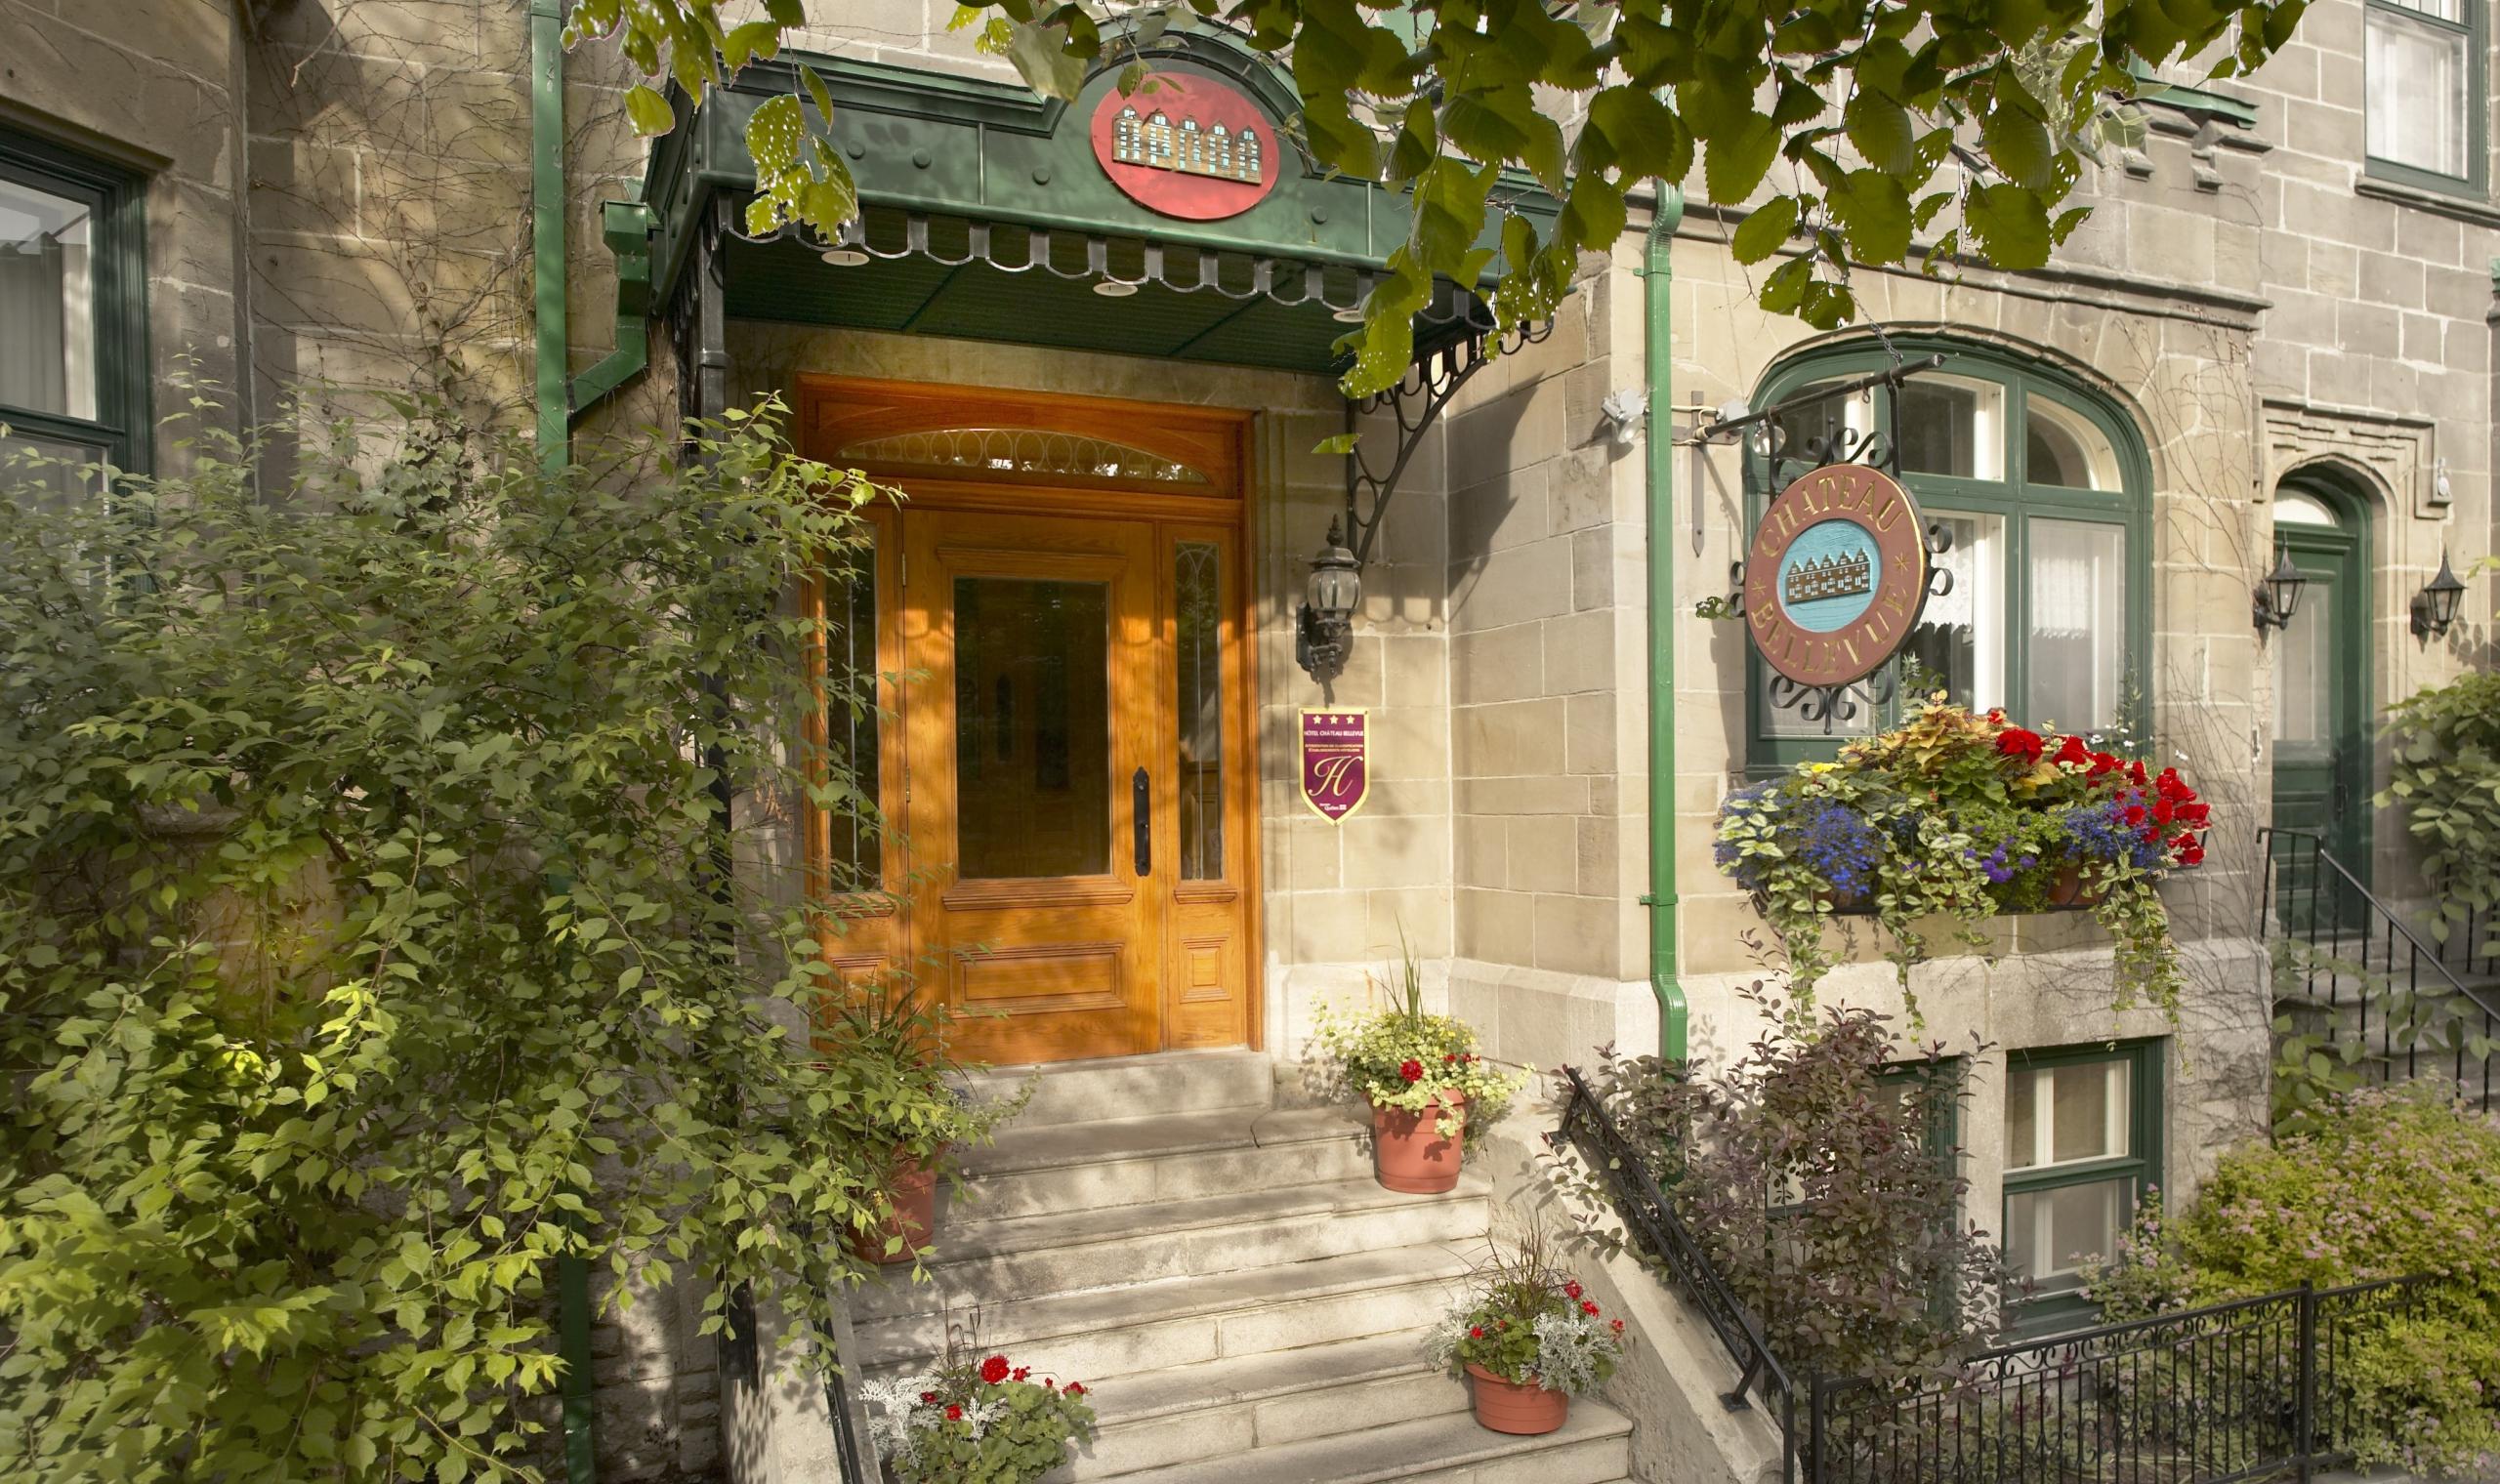 Hotel chateau bellevue quebec city canadian affair for Design hotel quebec city